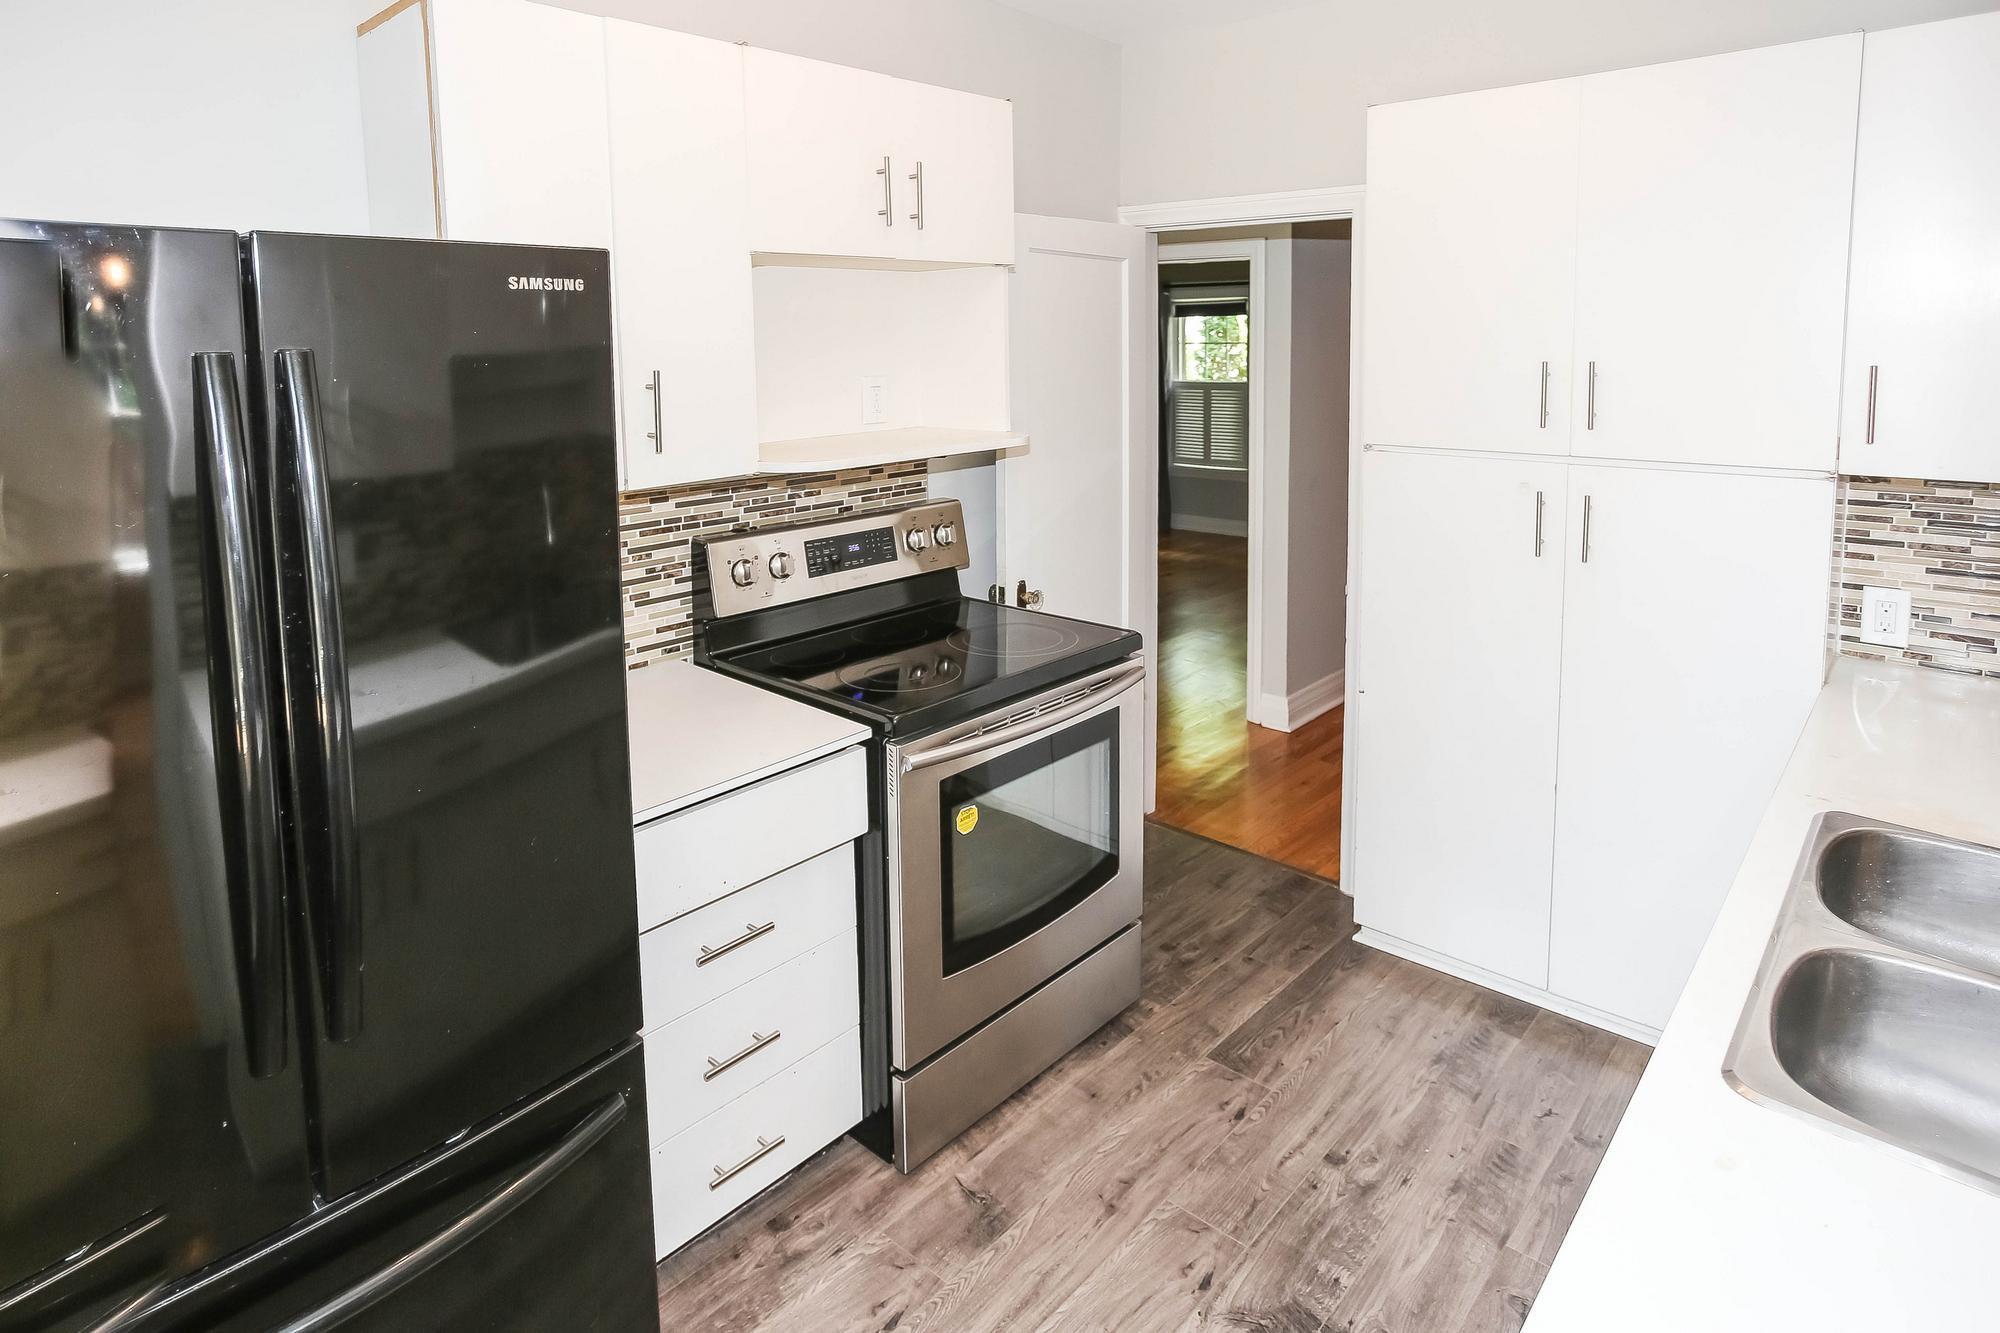 Photo 12: Photos: 155 Borebank Street in Winnipeg: River Heights Single Family Detached for sale (1C)  : MLS®# 202017166